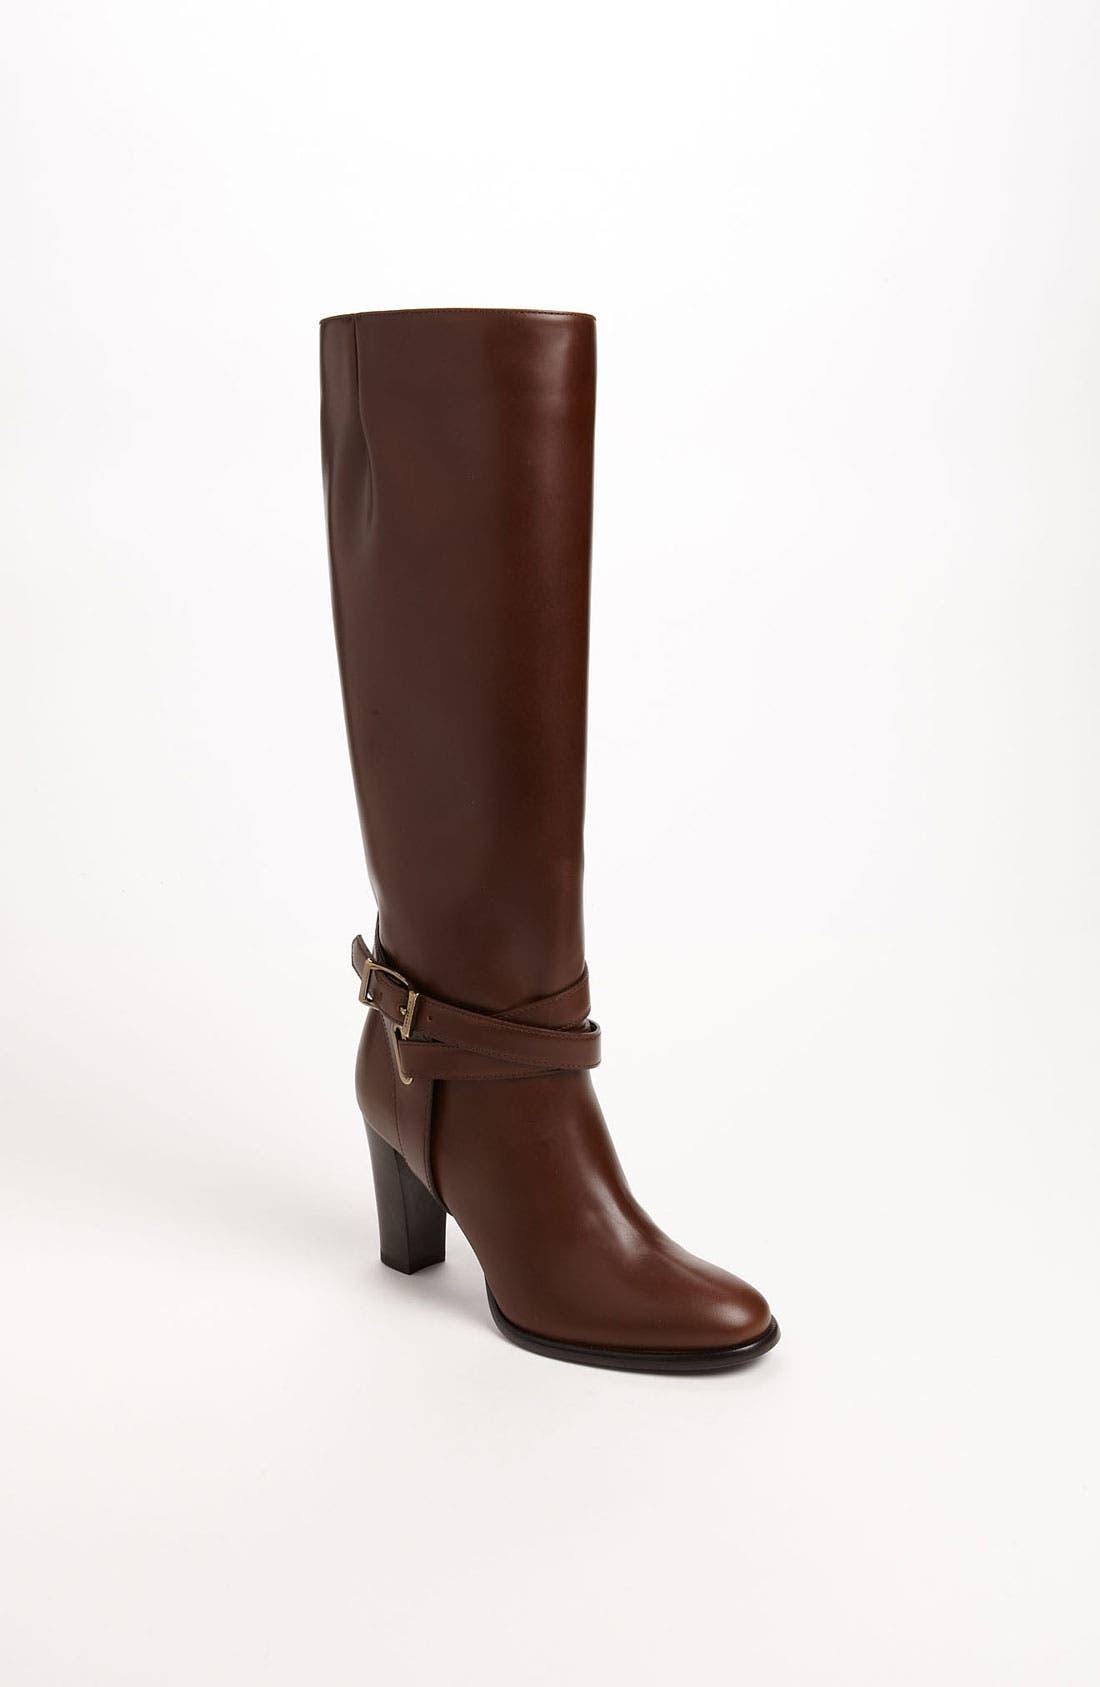 Alternate Image 1 Selected - Burberry 'Adeline' High Heel Boot